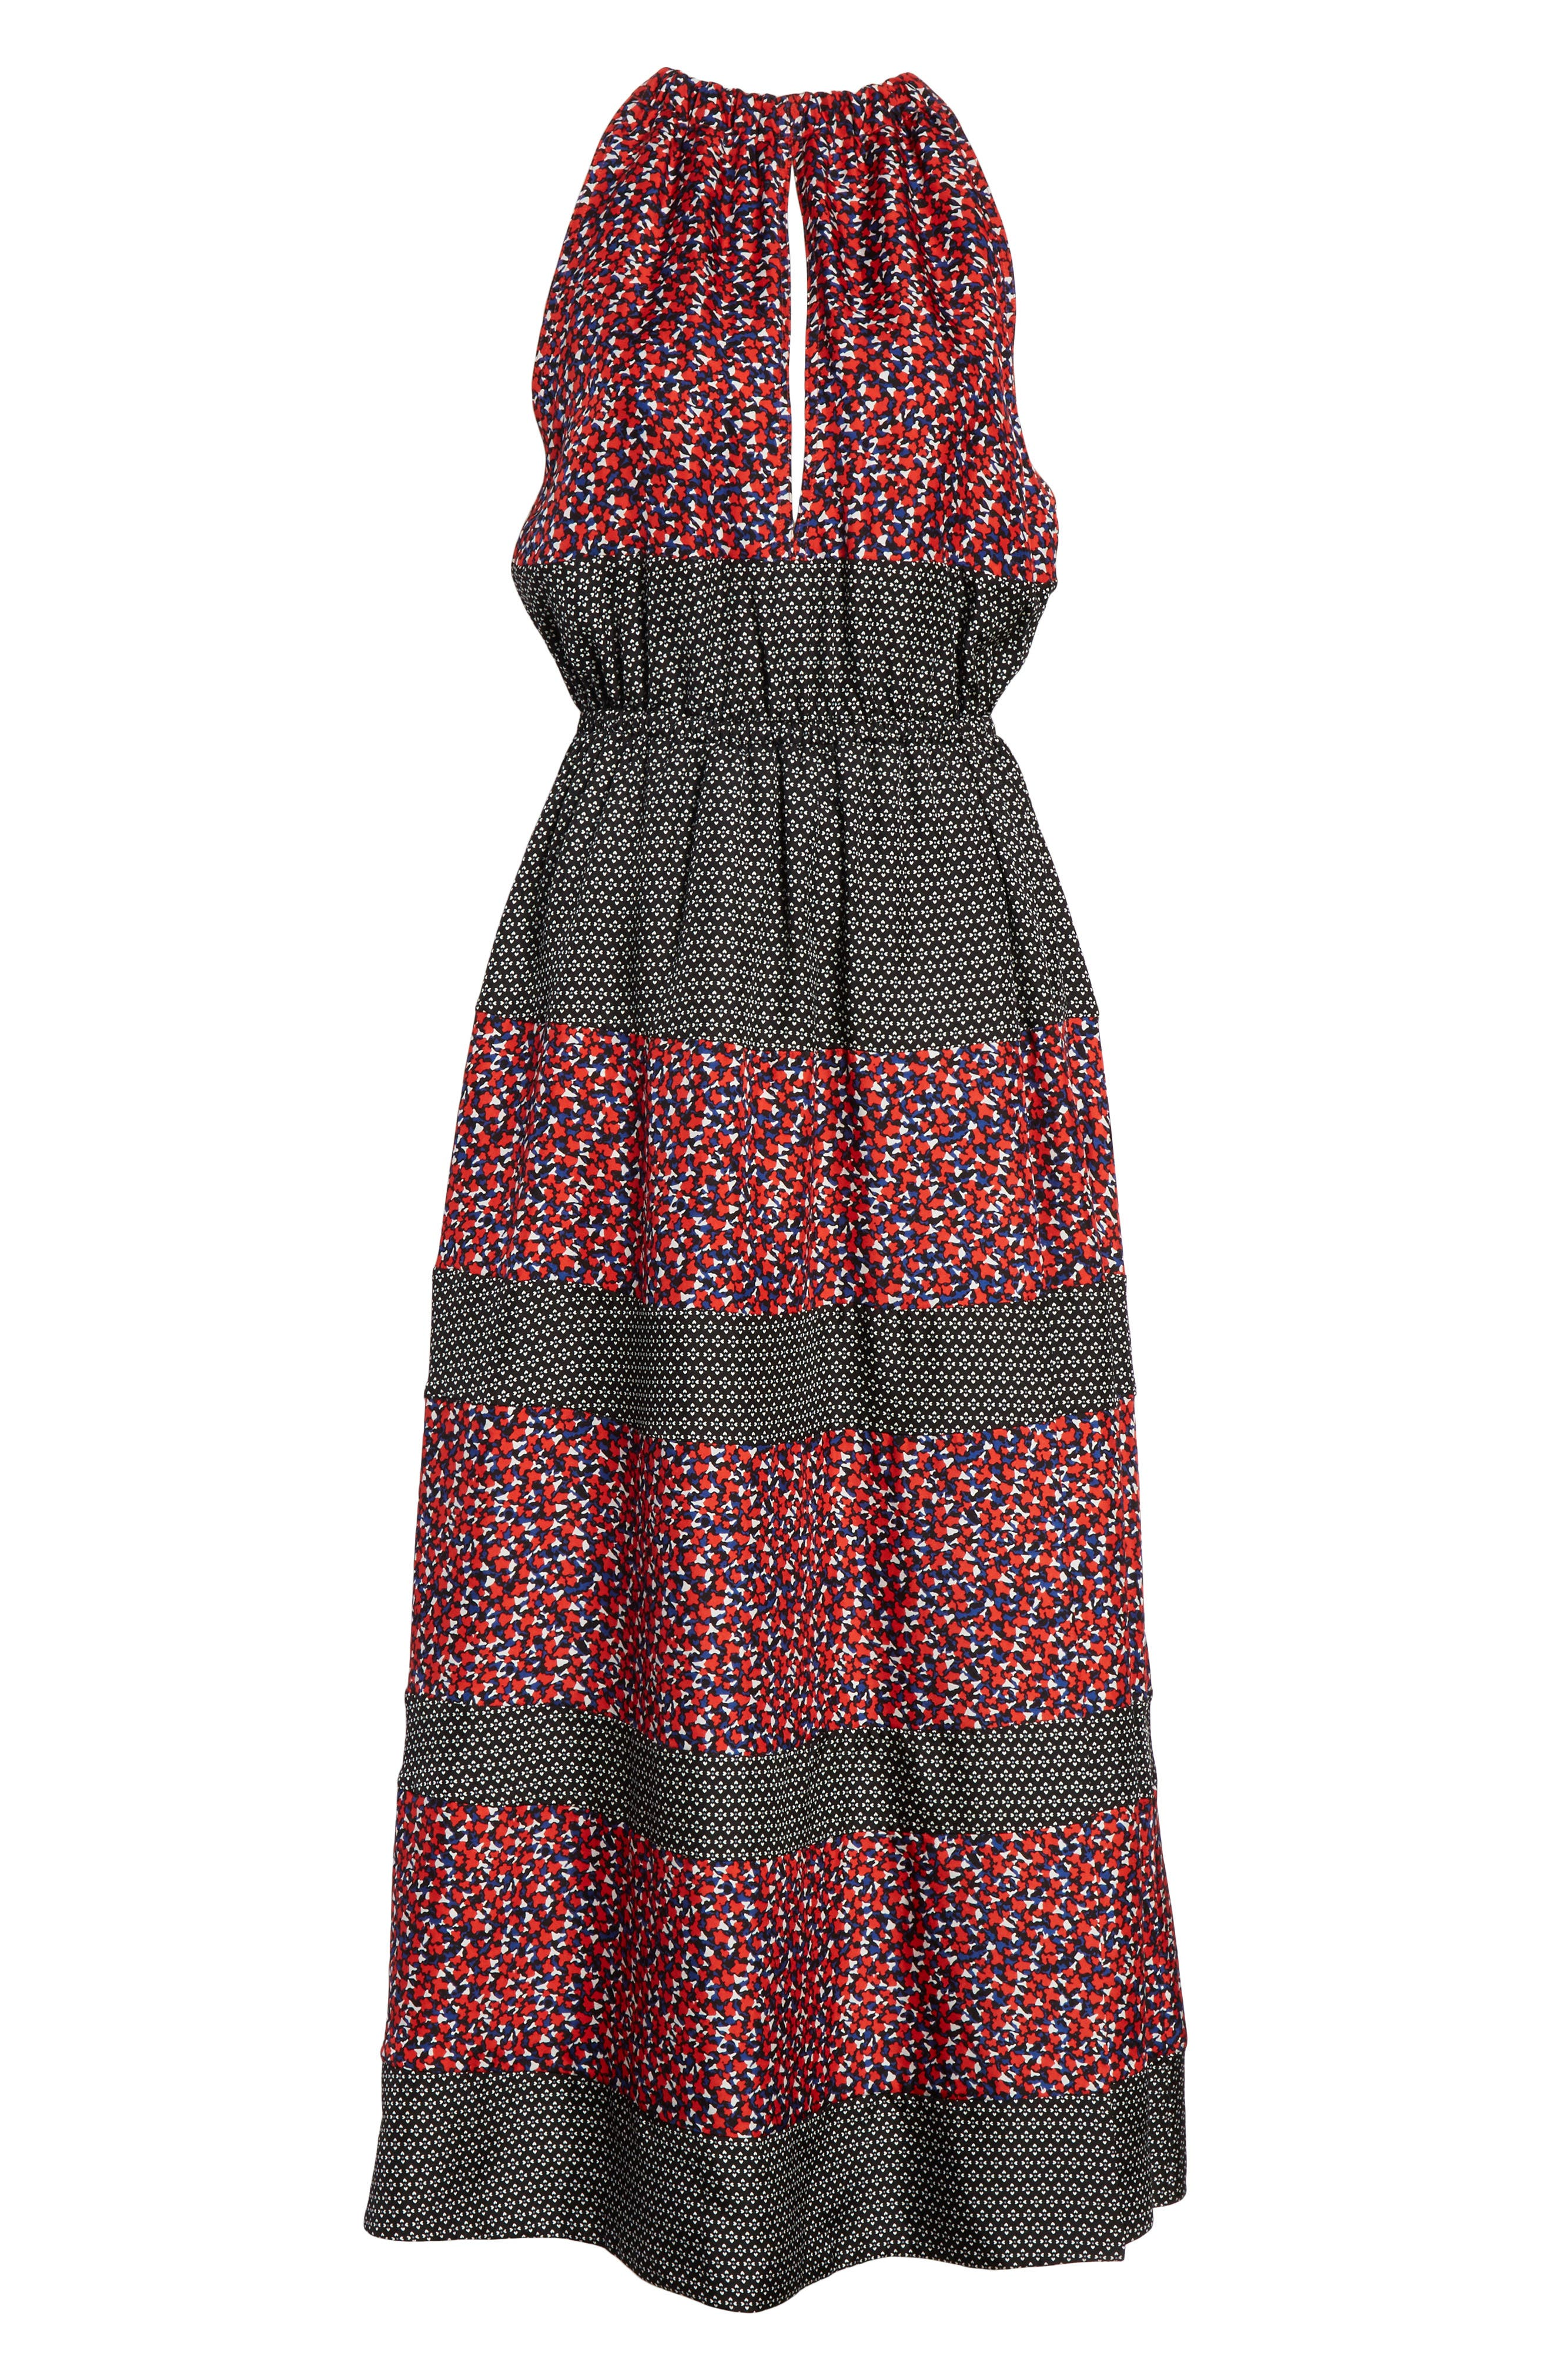 Mixed Print Halter Dress,                             Alternate thumbnail 6, color,                             601